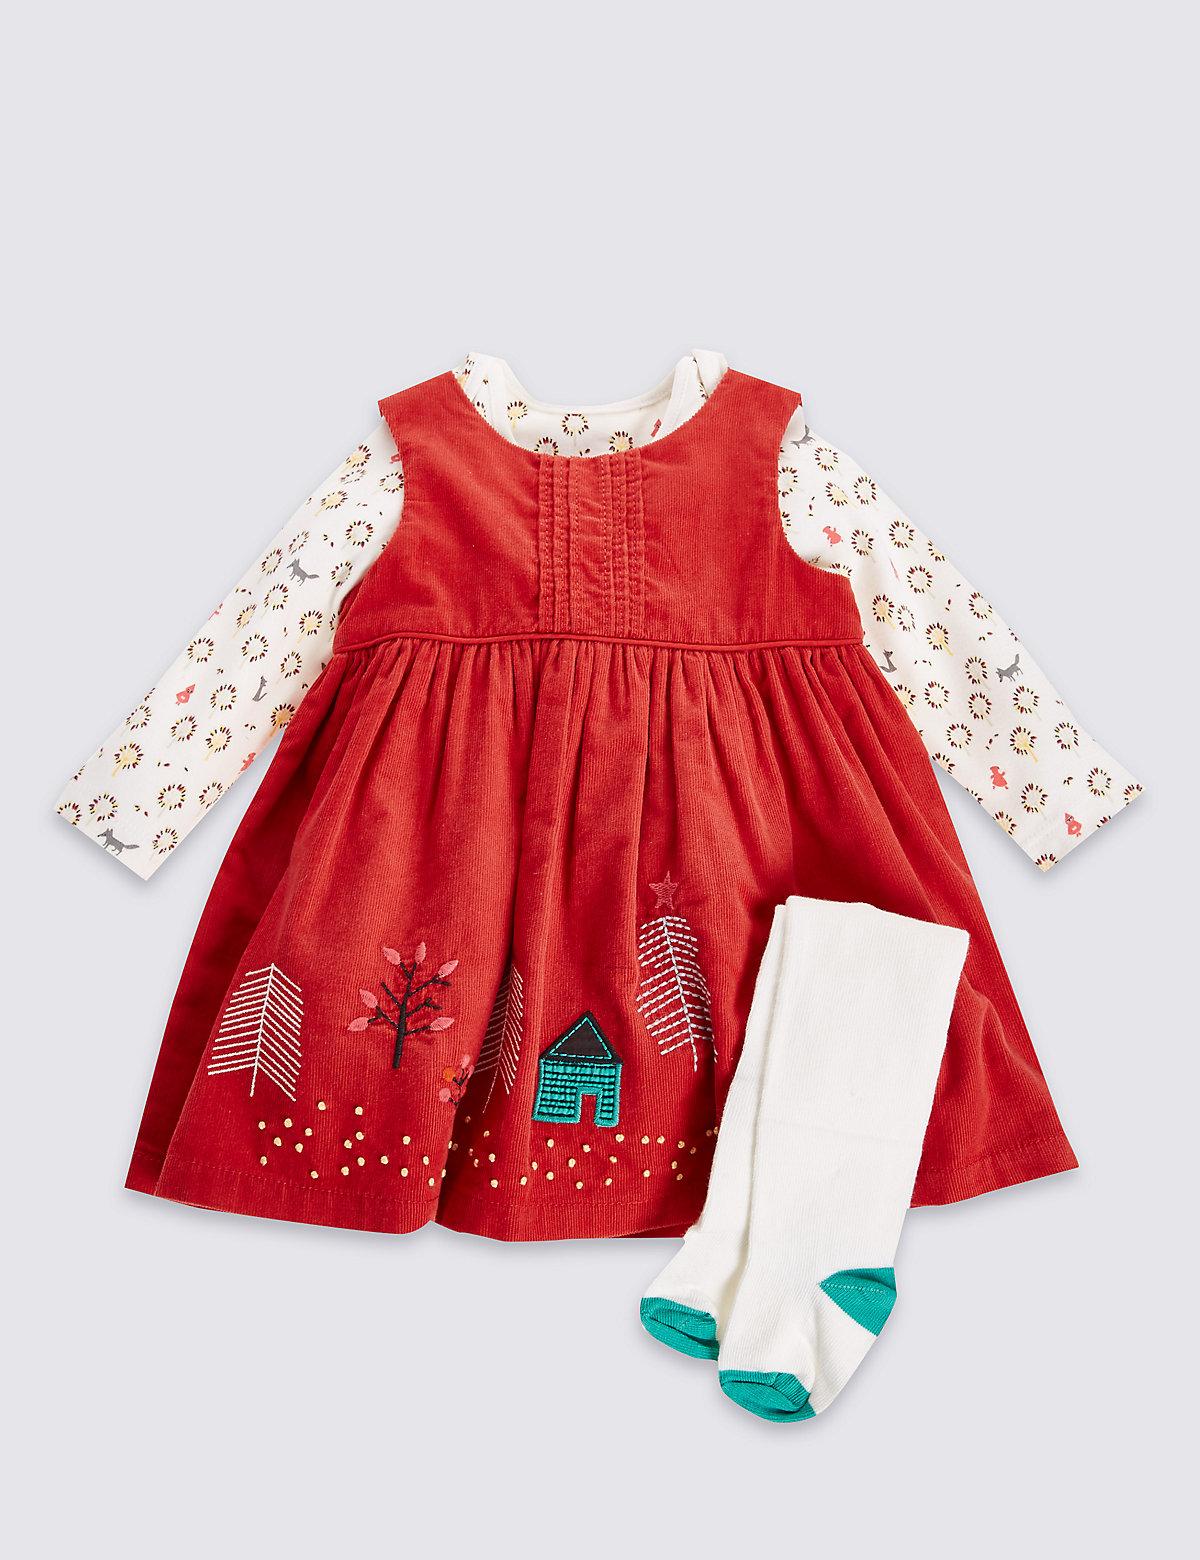 3 Piece Pure Cotton Applique Cord Pinny Dress